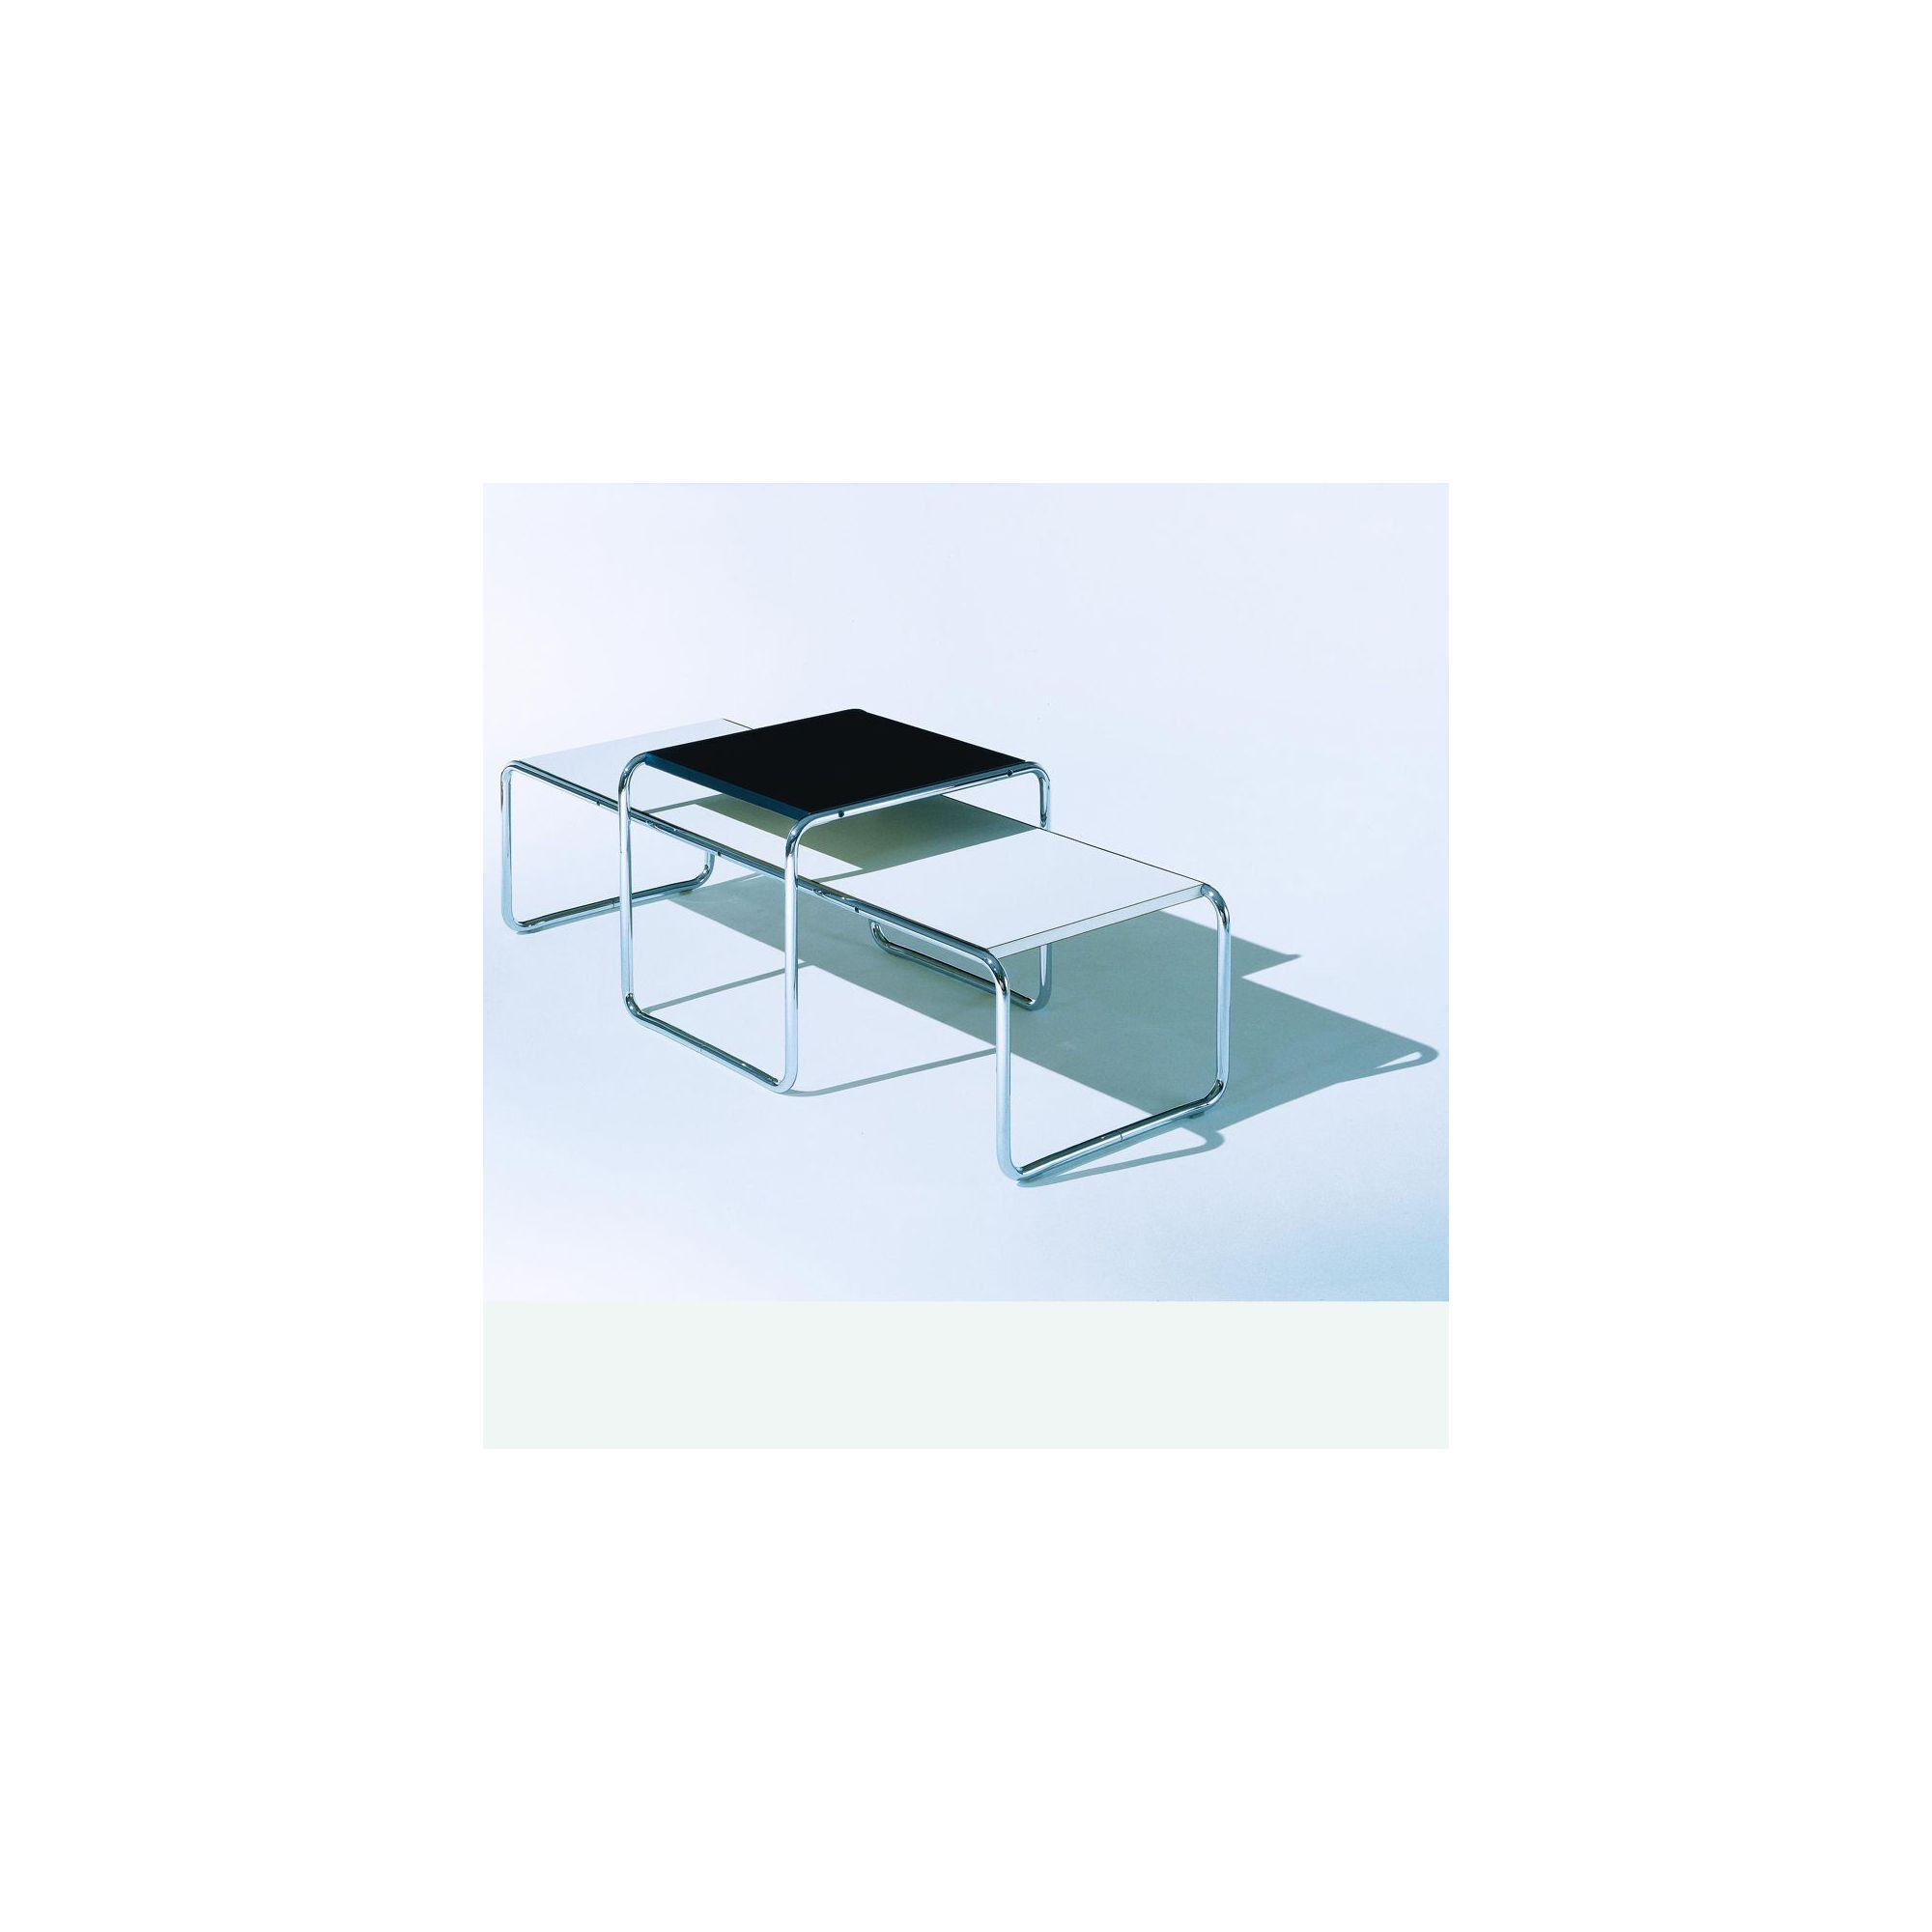 Knoll Laccio Square Table by Breuer - Quick Ship! - Black at Tesco Direct